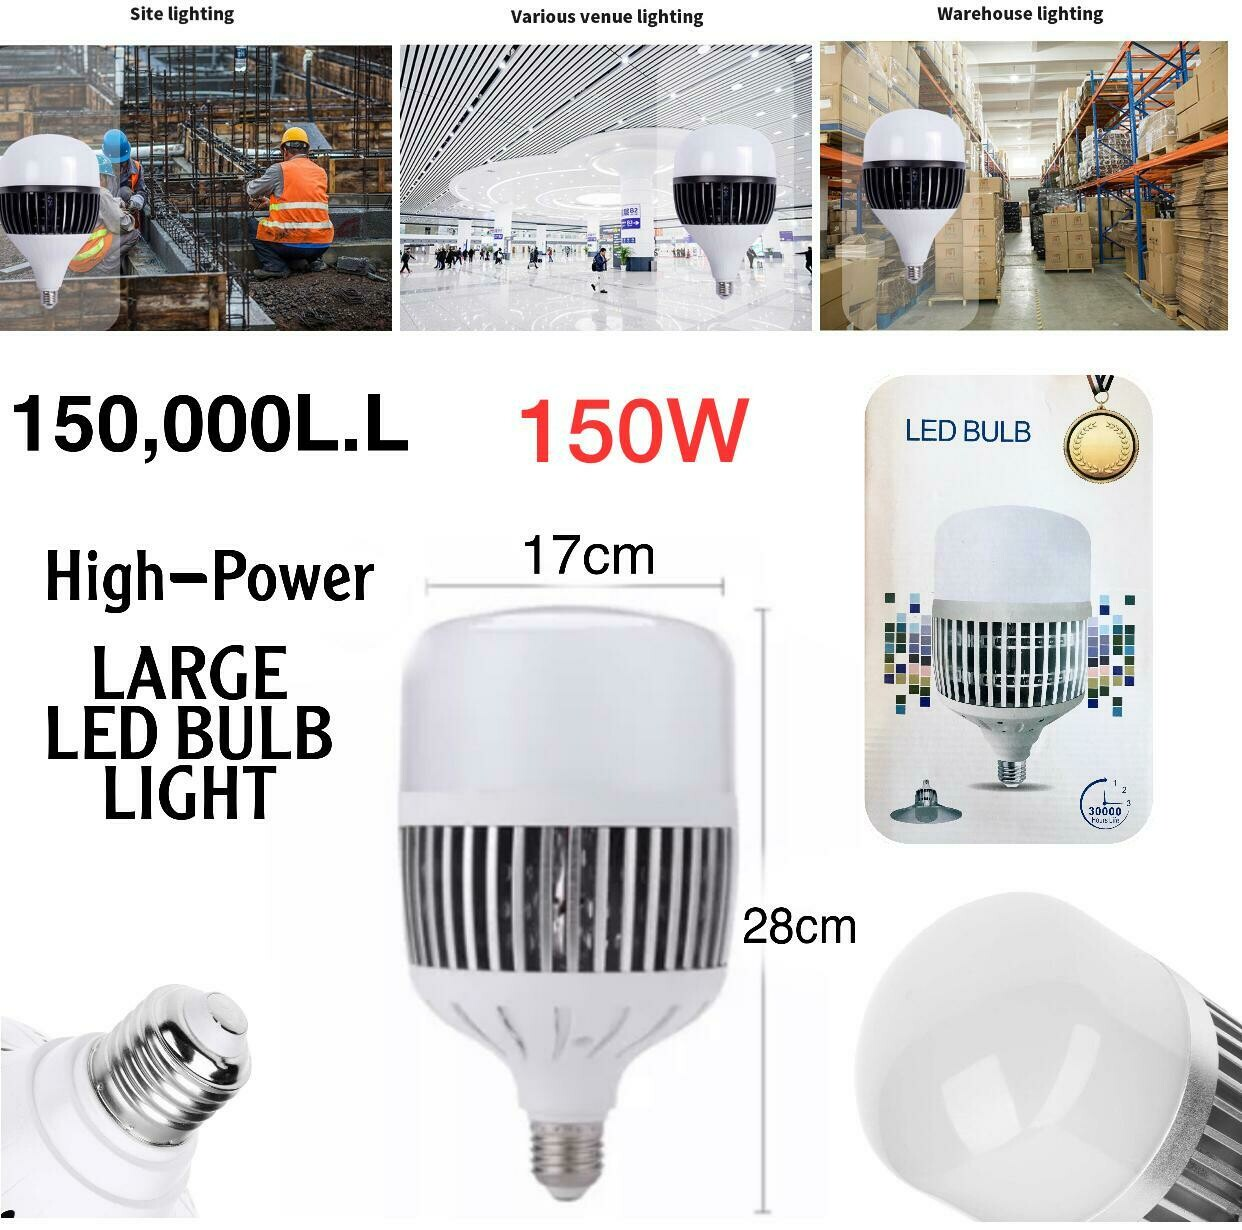 Large LED Bulb 150W